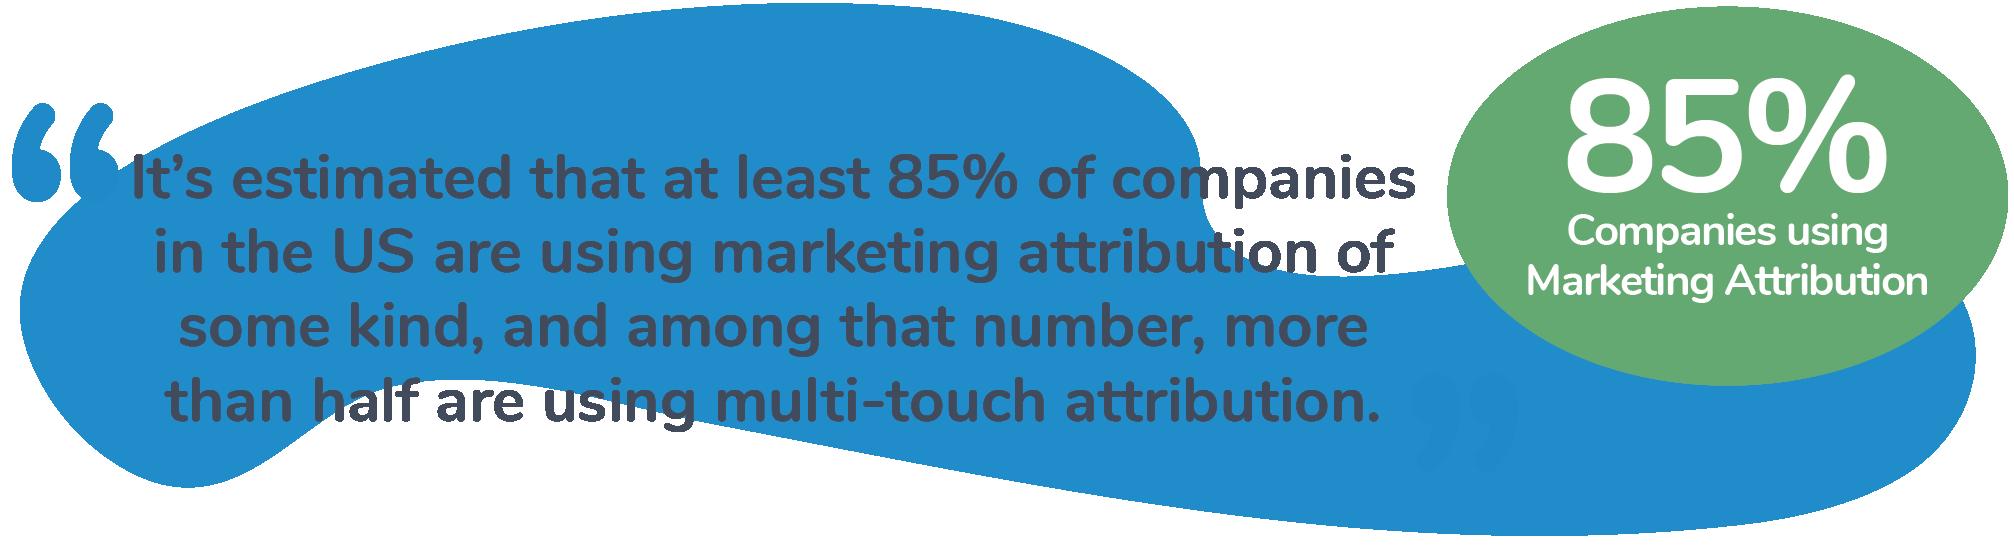 Companies using Marketing Attribution